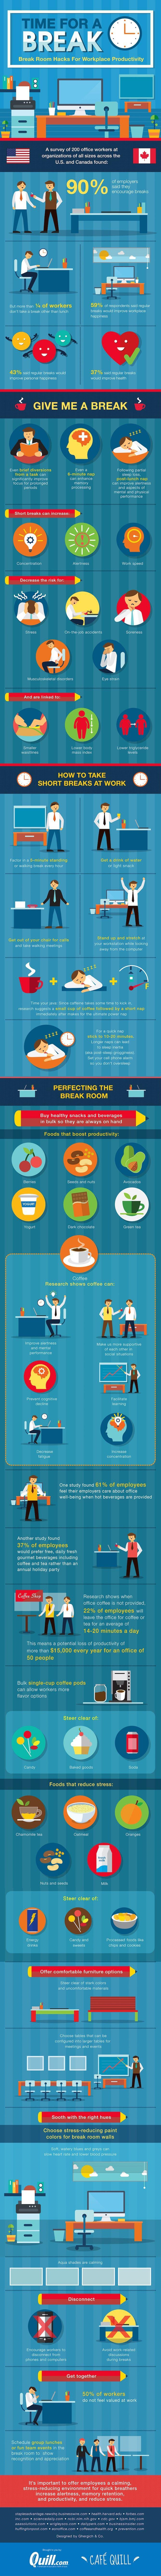 59 best Business General images on Pinterest | Productivity ...